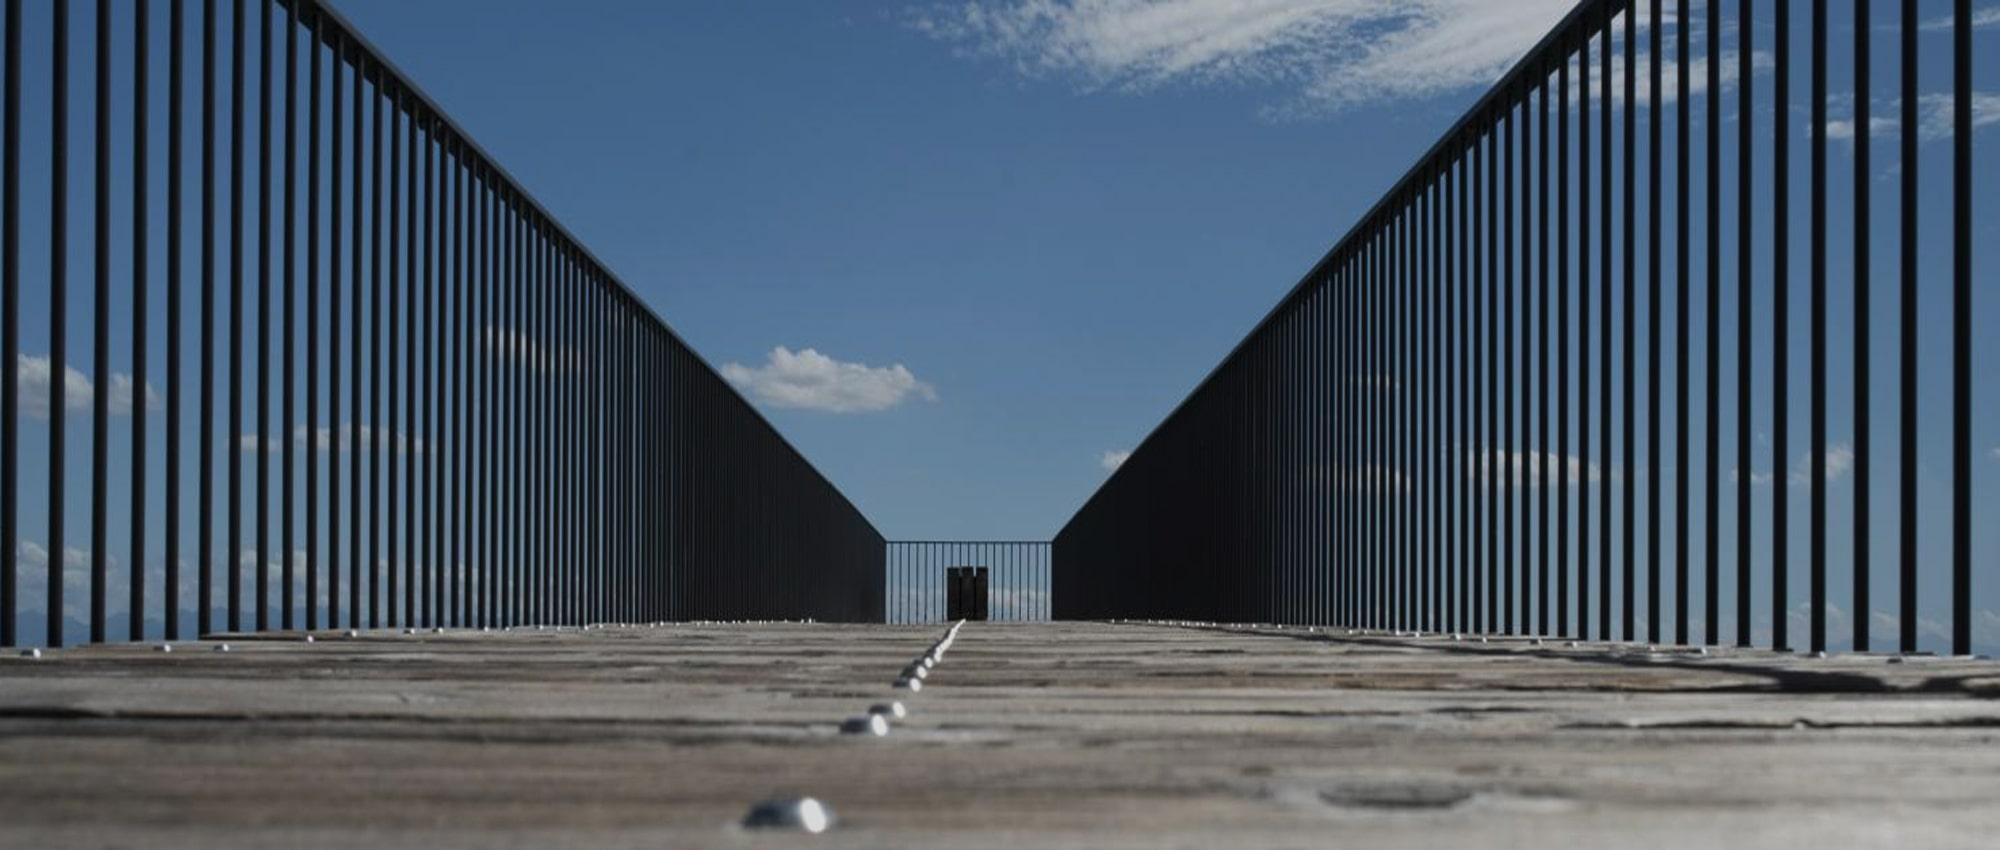 metal-fencing-1